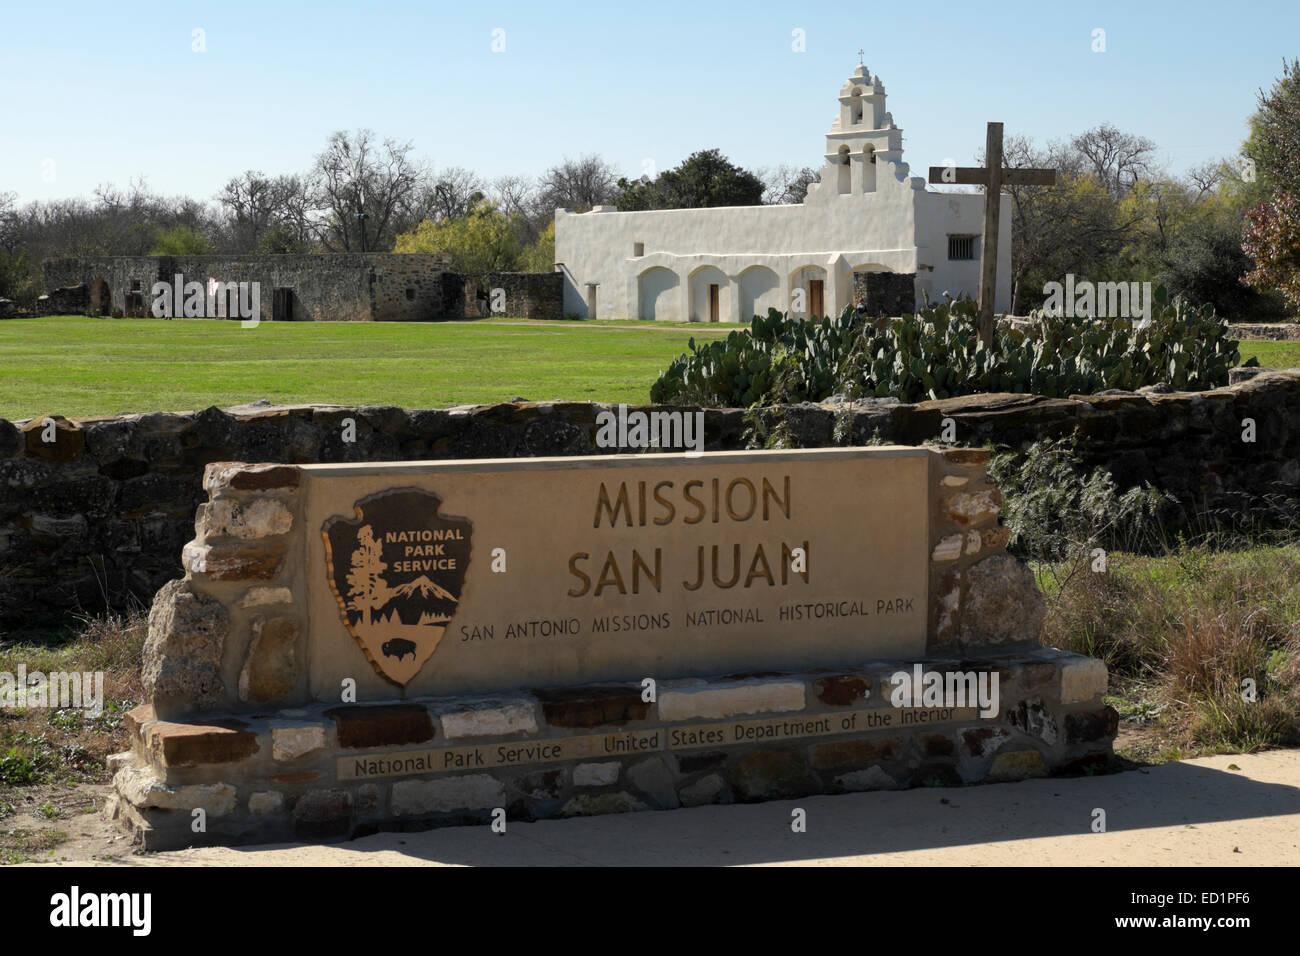 National historical park service sign at the entrance of mission san juan capistrano at san antonio texas